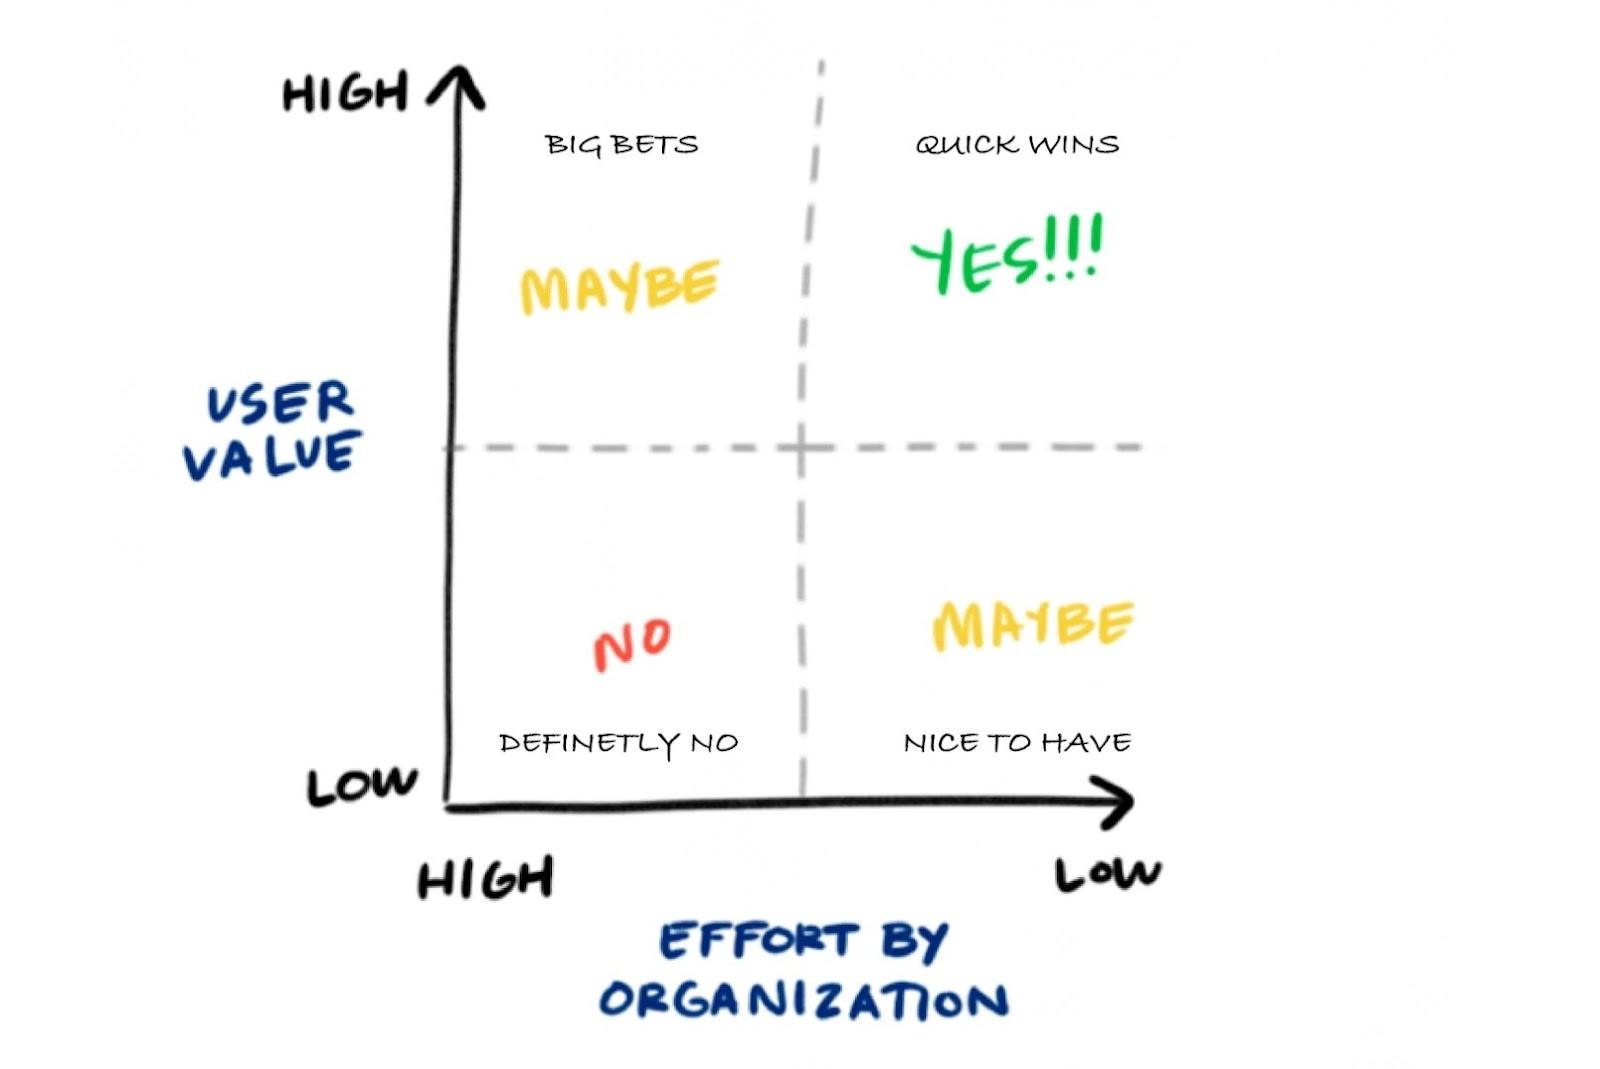 value vs effort ratio